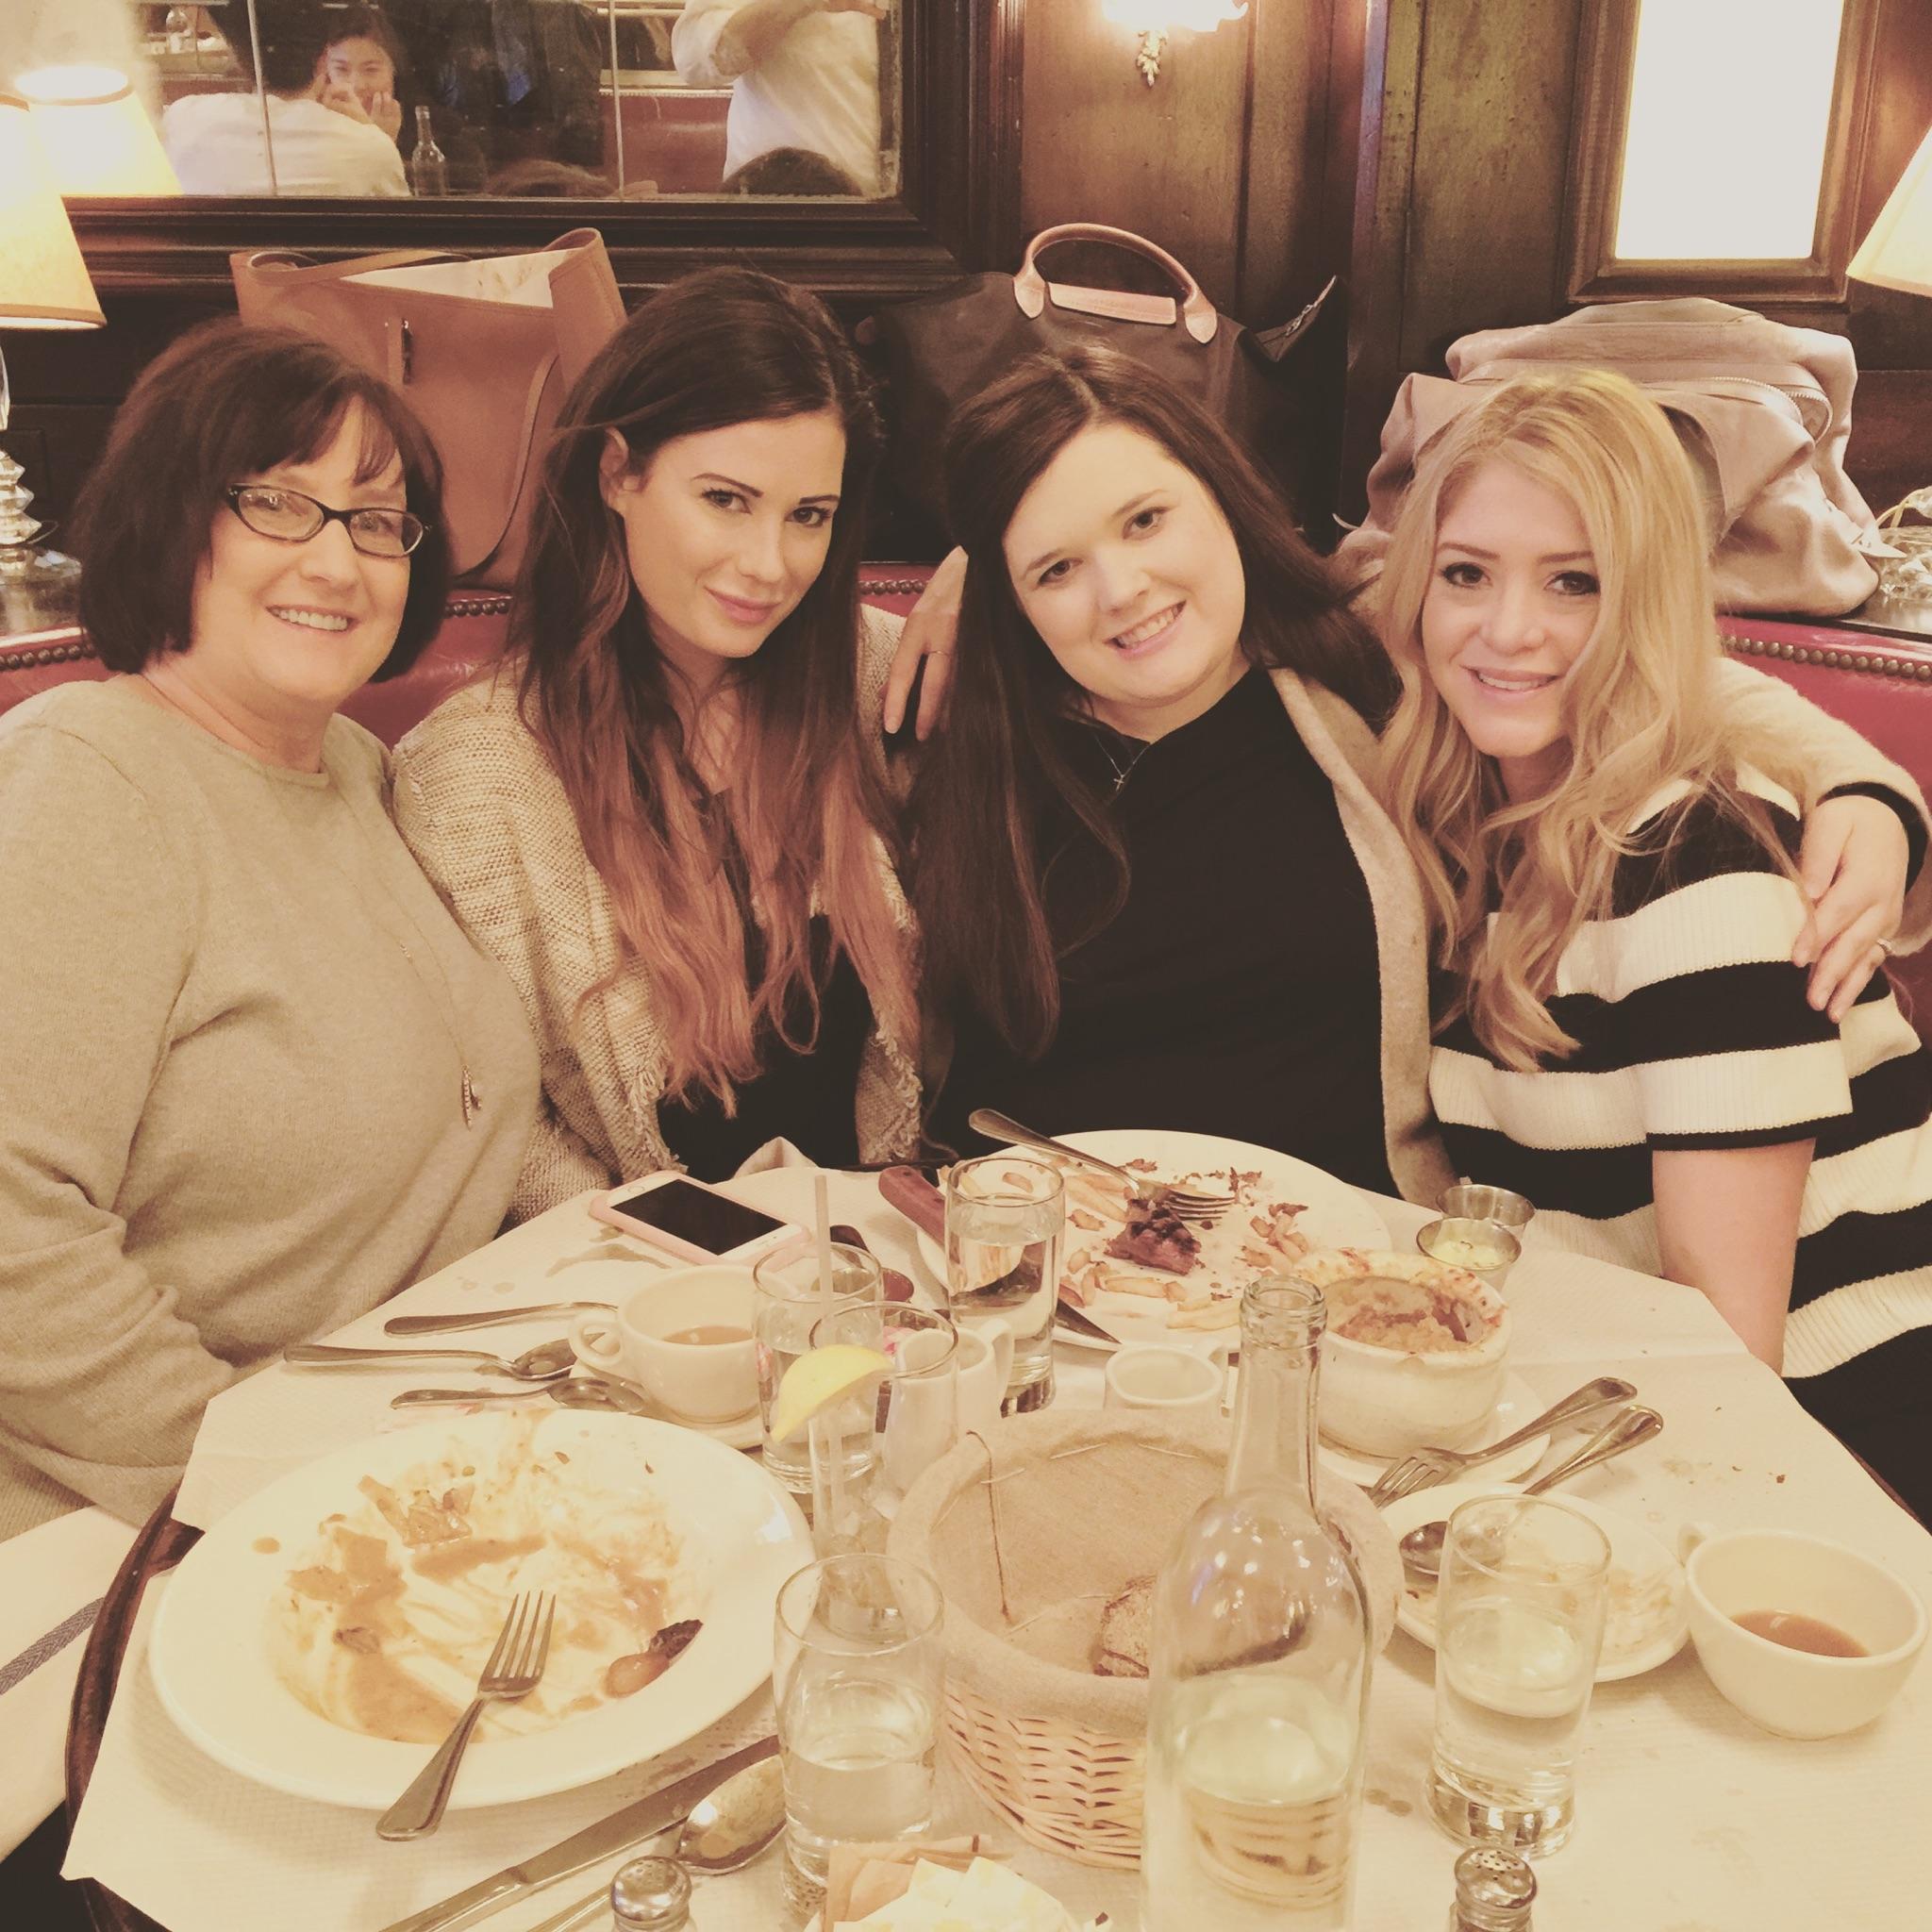 Teresa, Kara, Ella, and Morgan. iPhone photo via Teresa Leonard.